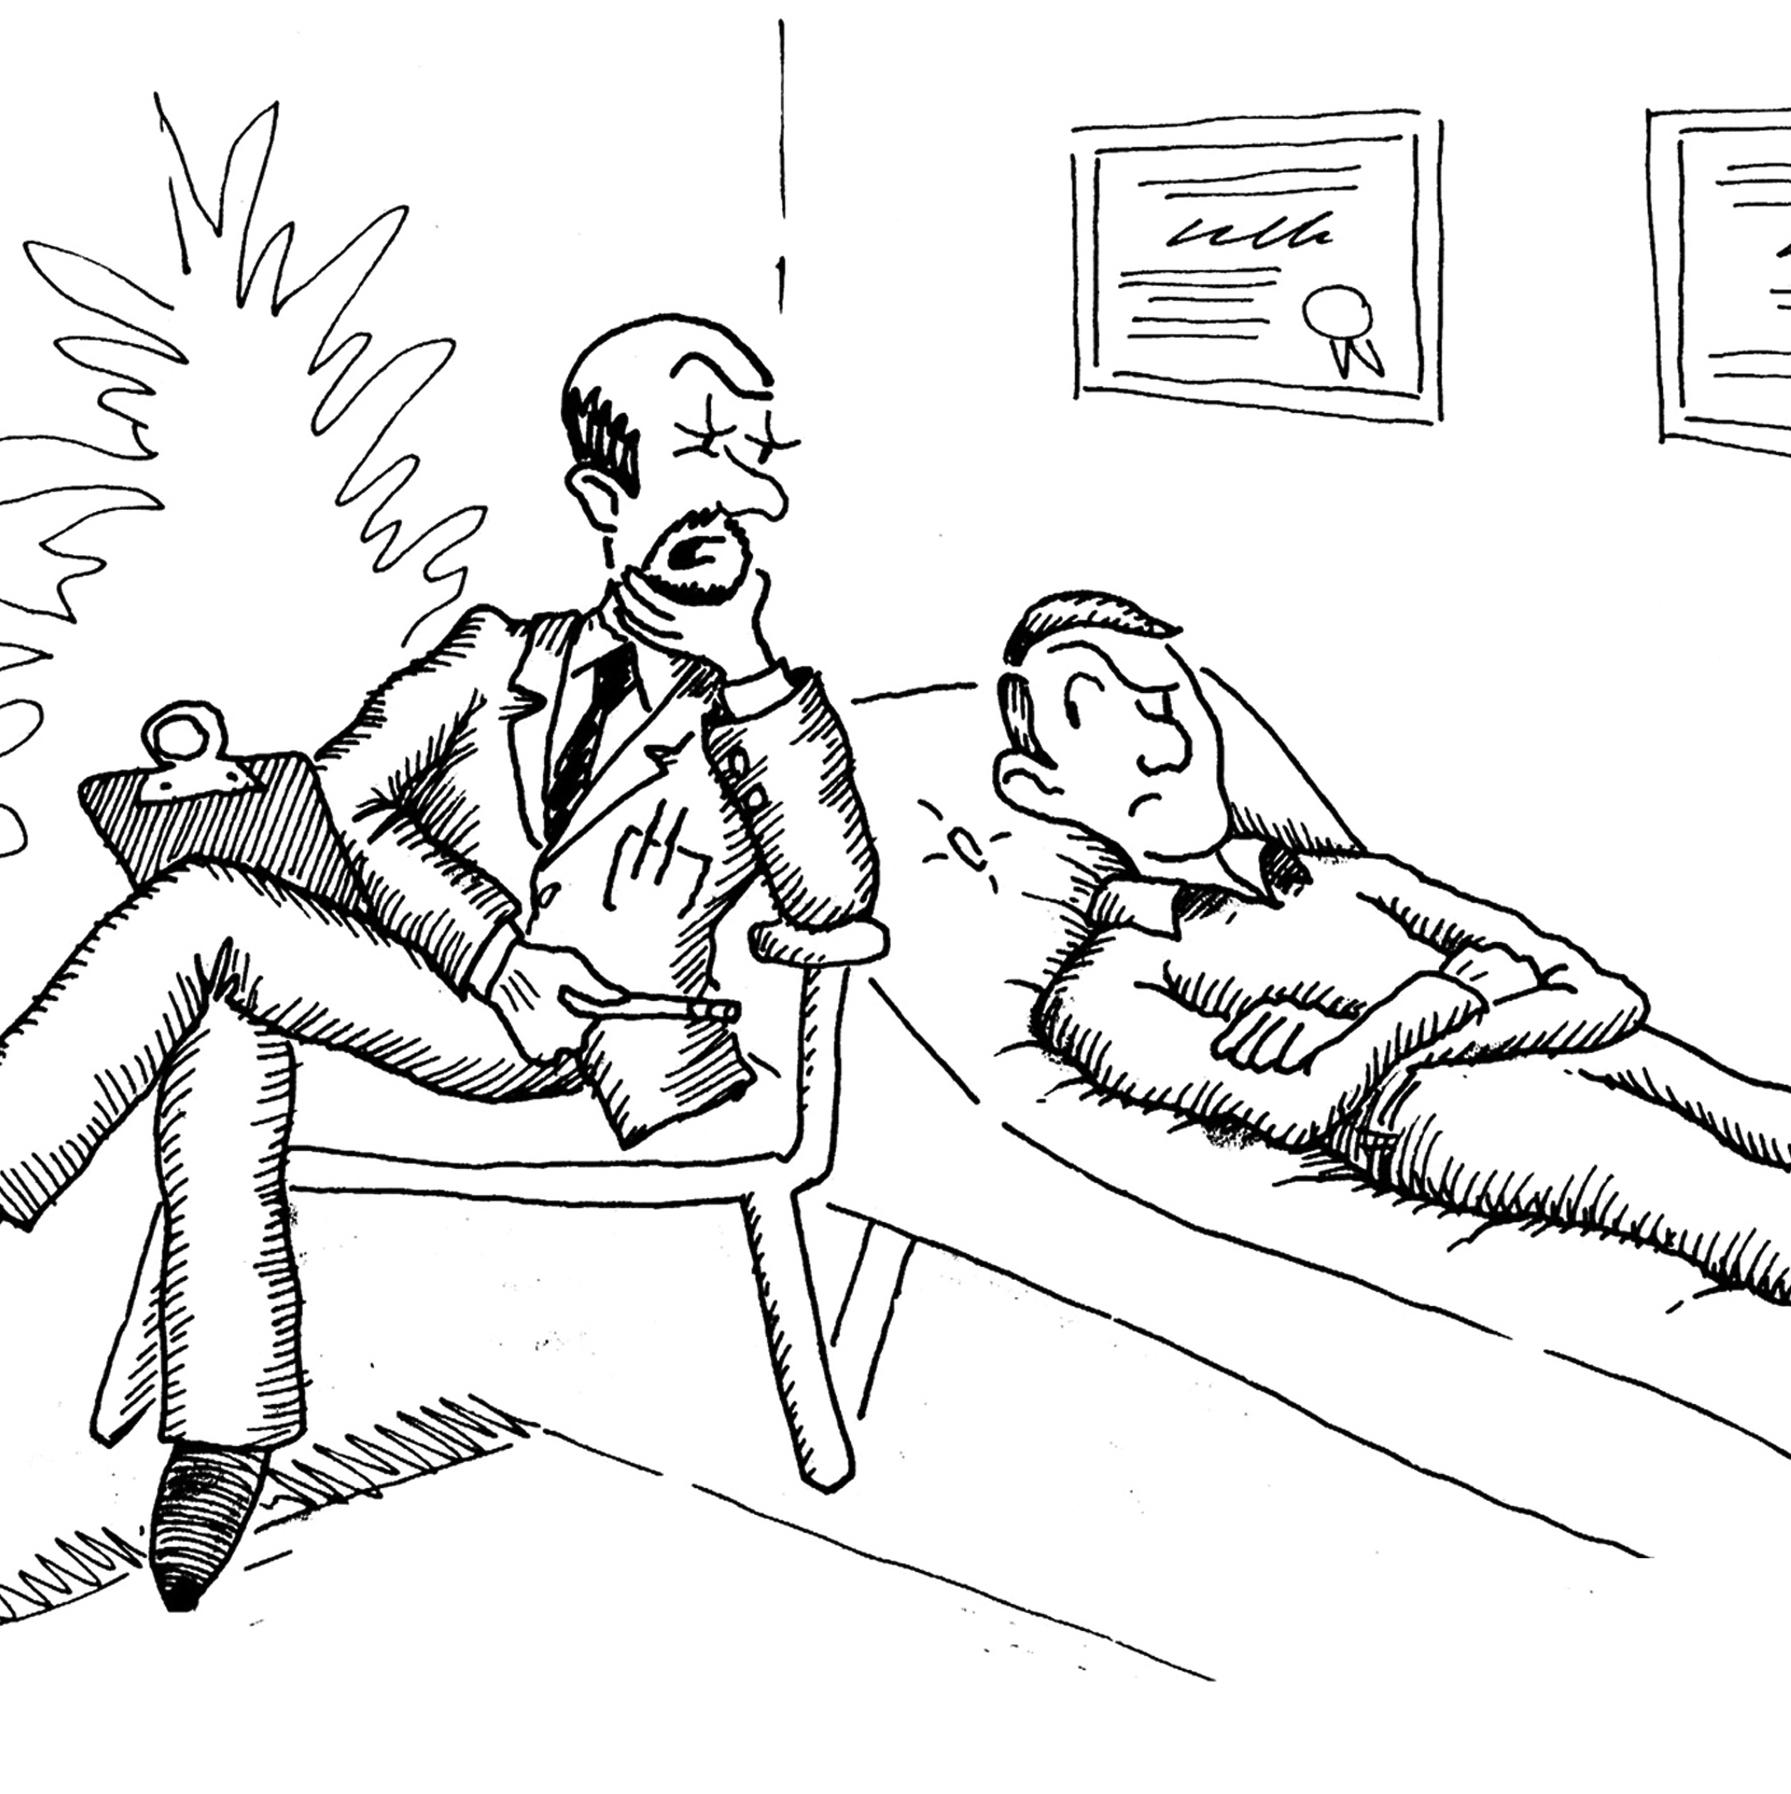 Examining the non-verbal behaviours of psychiatrists